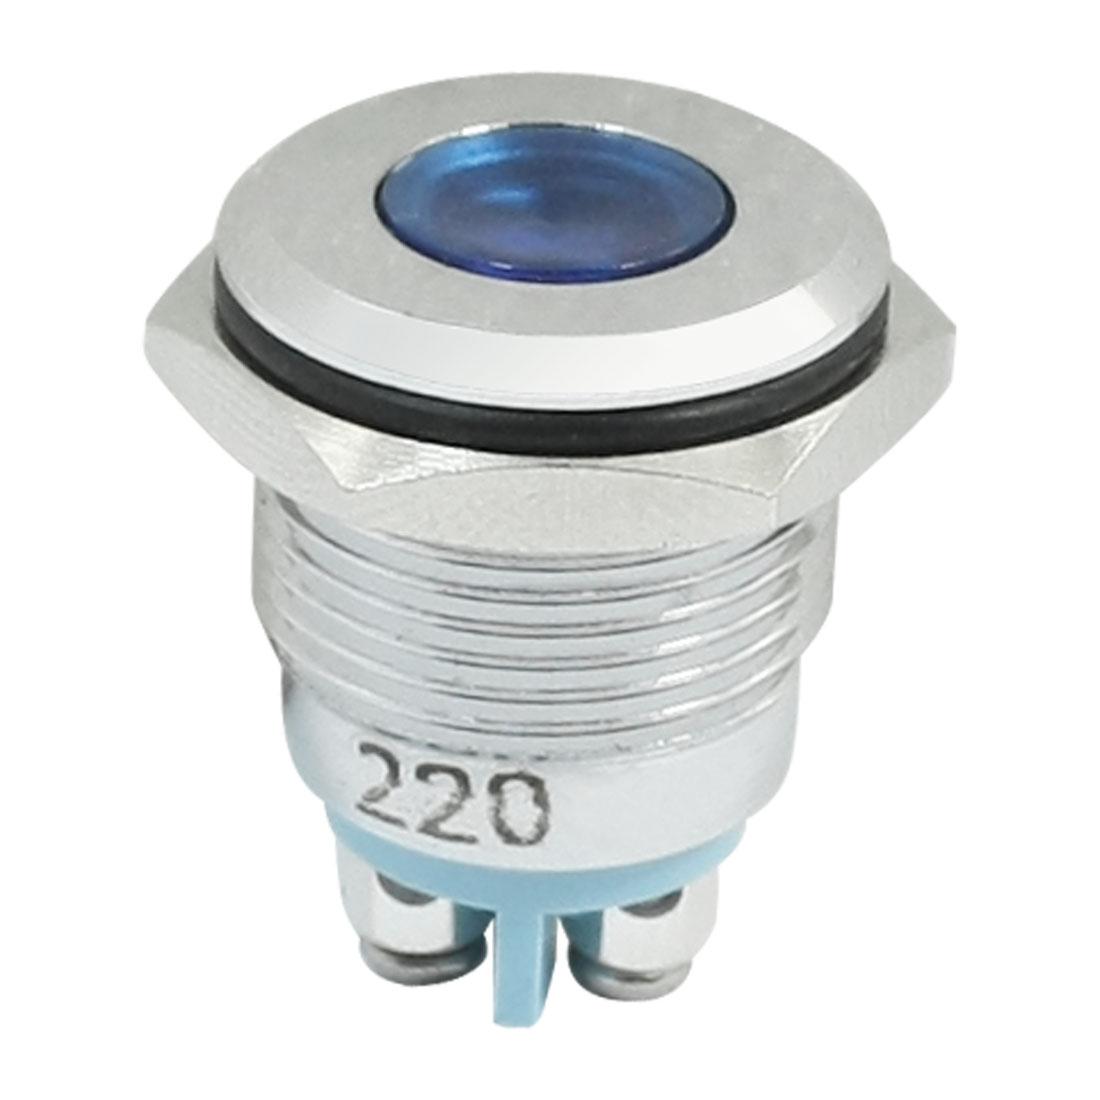 MQ16F-B 16mm Waterproof Blue LED Light Metal Signal Lamp DC 220V